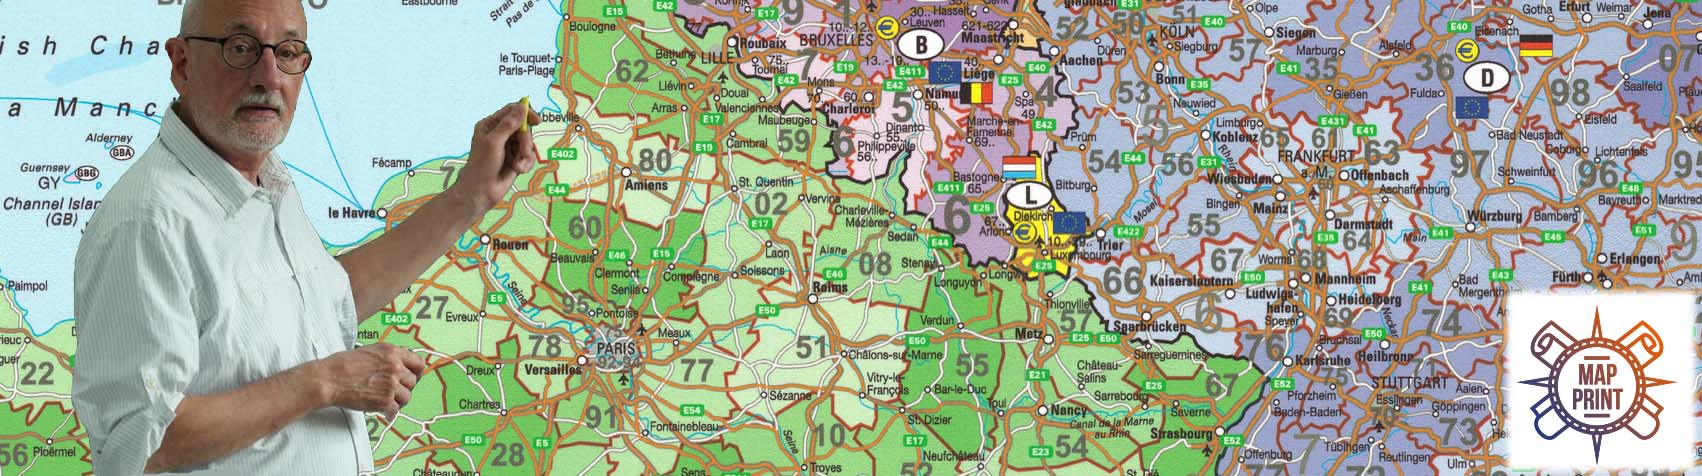 logist-map